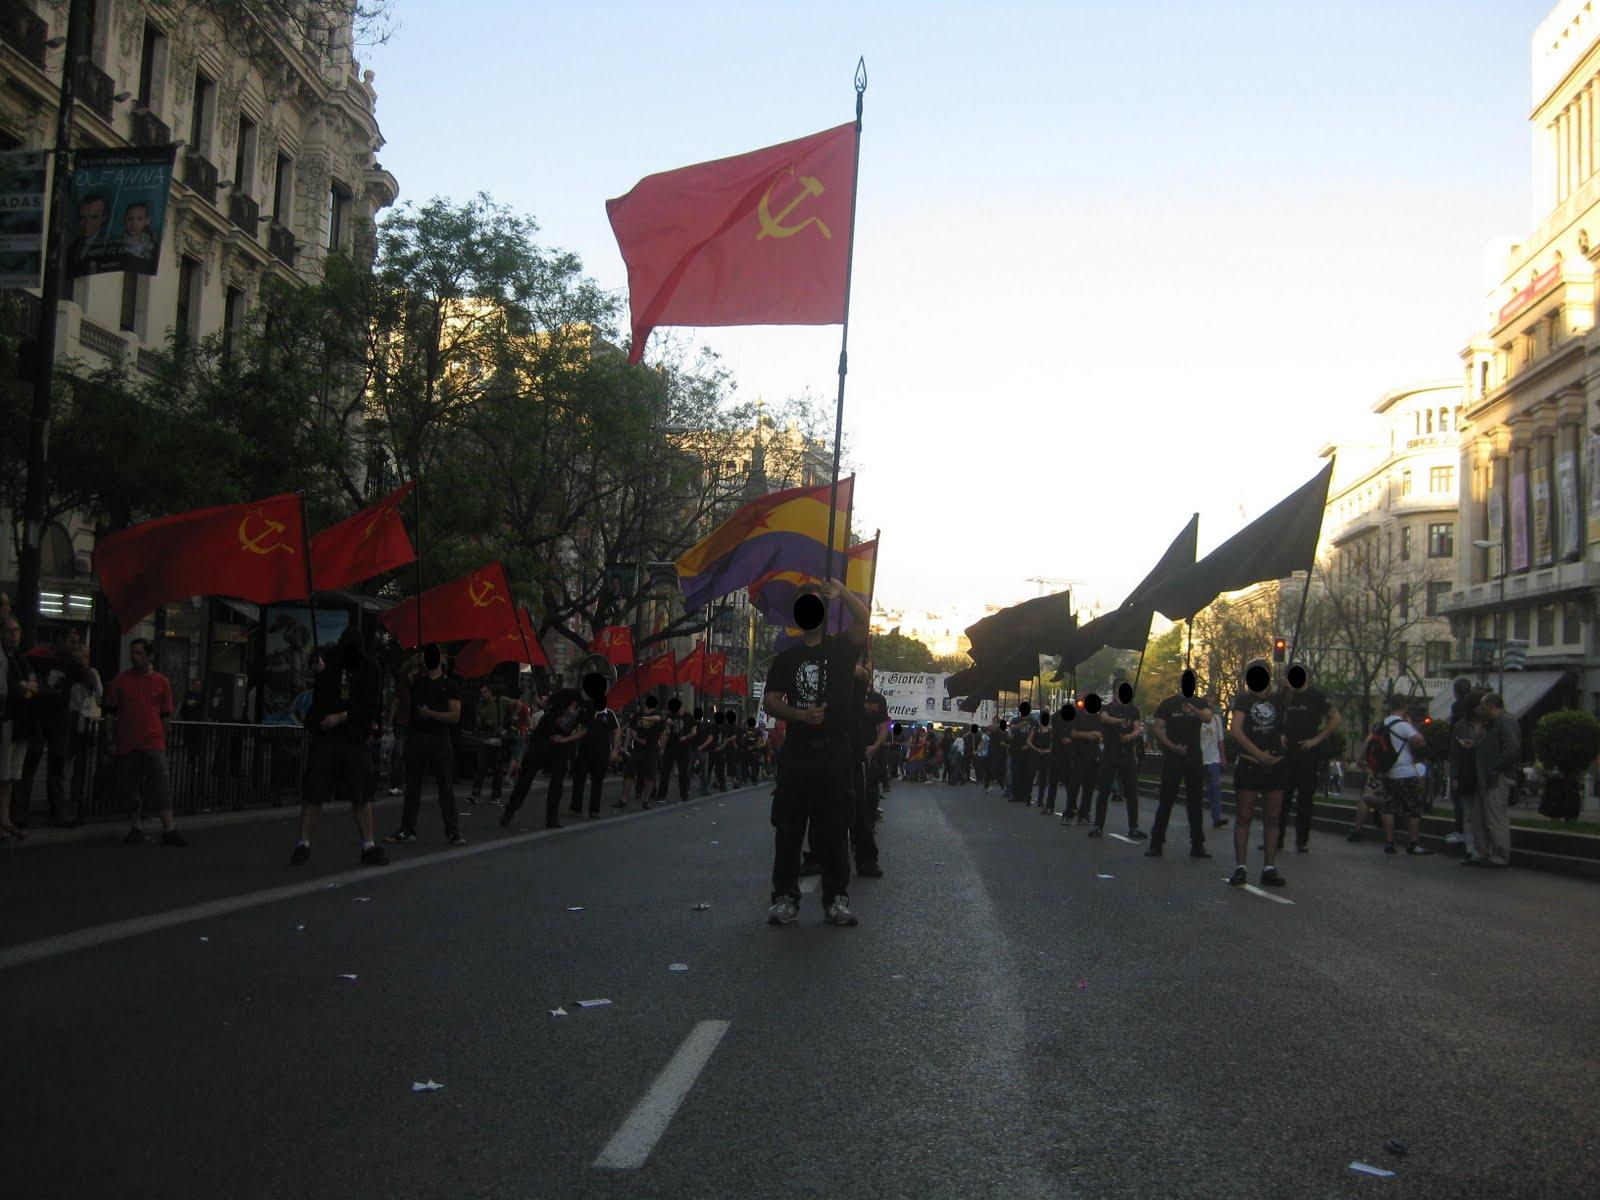 Reconstrucción Comunista ¿qué os parecen? 3